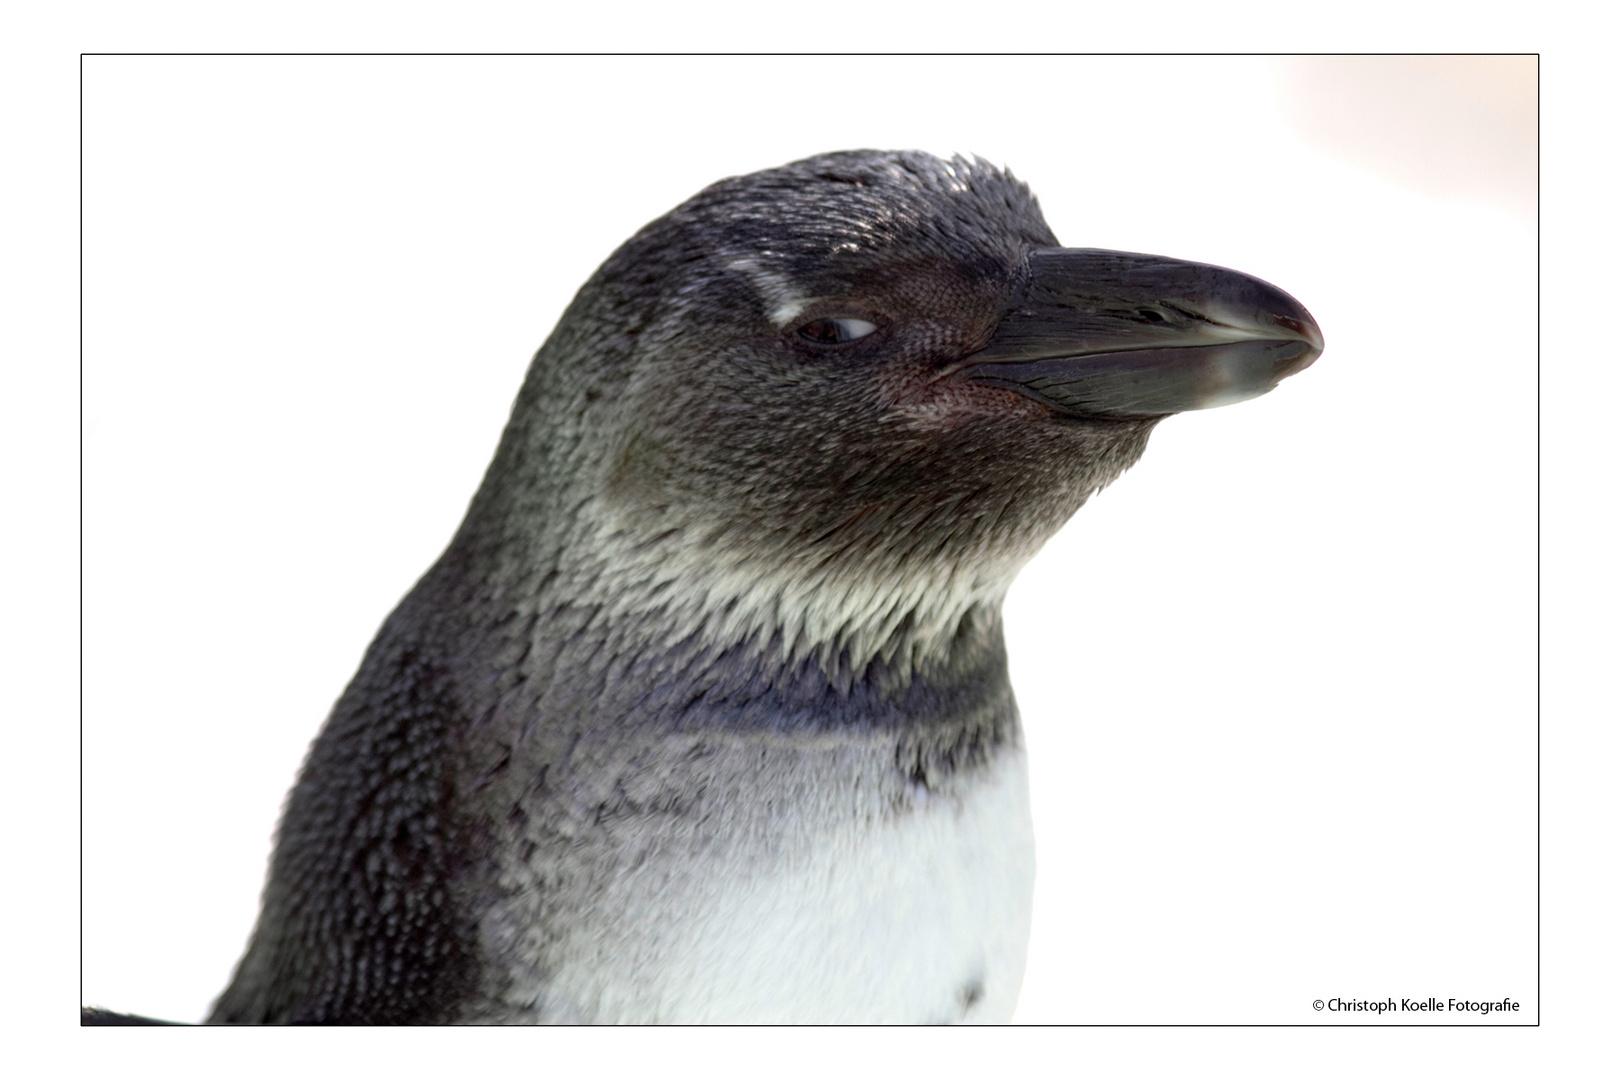 Pinguin-Schelm